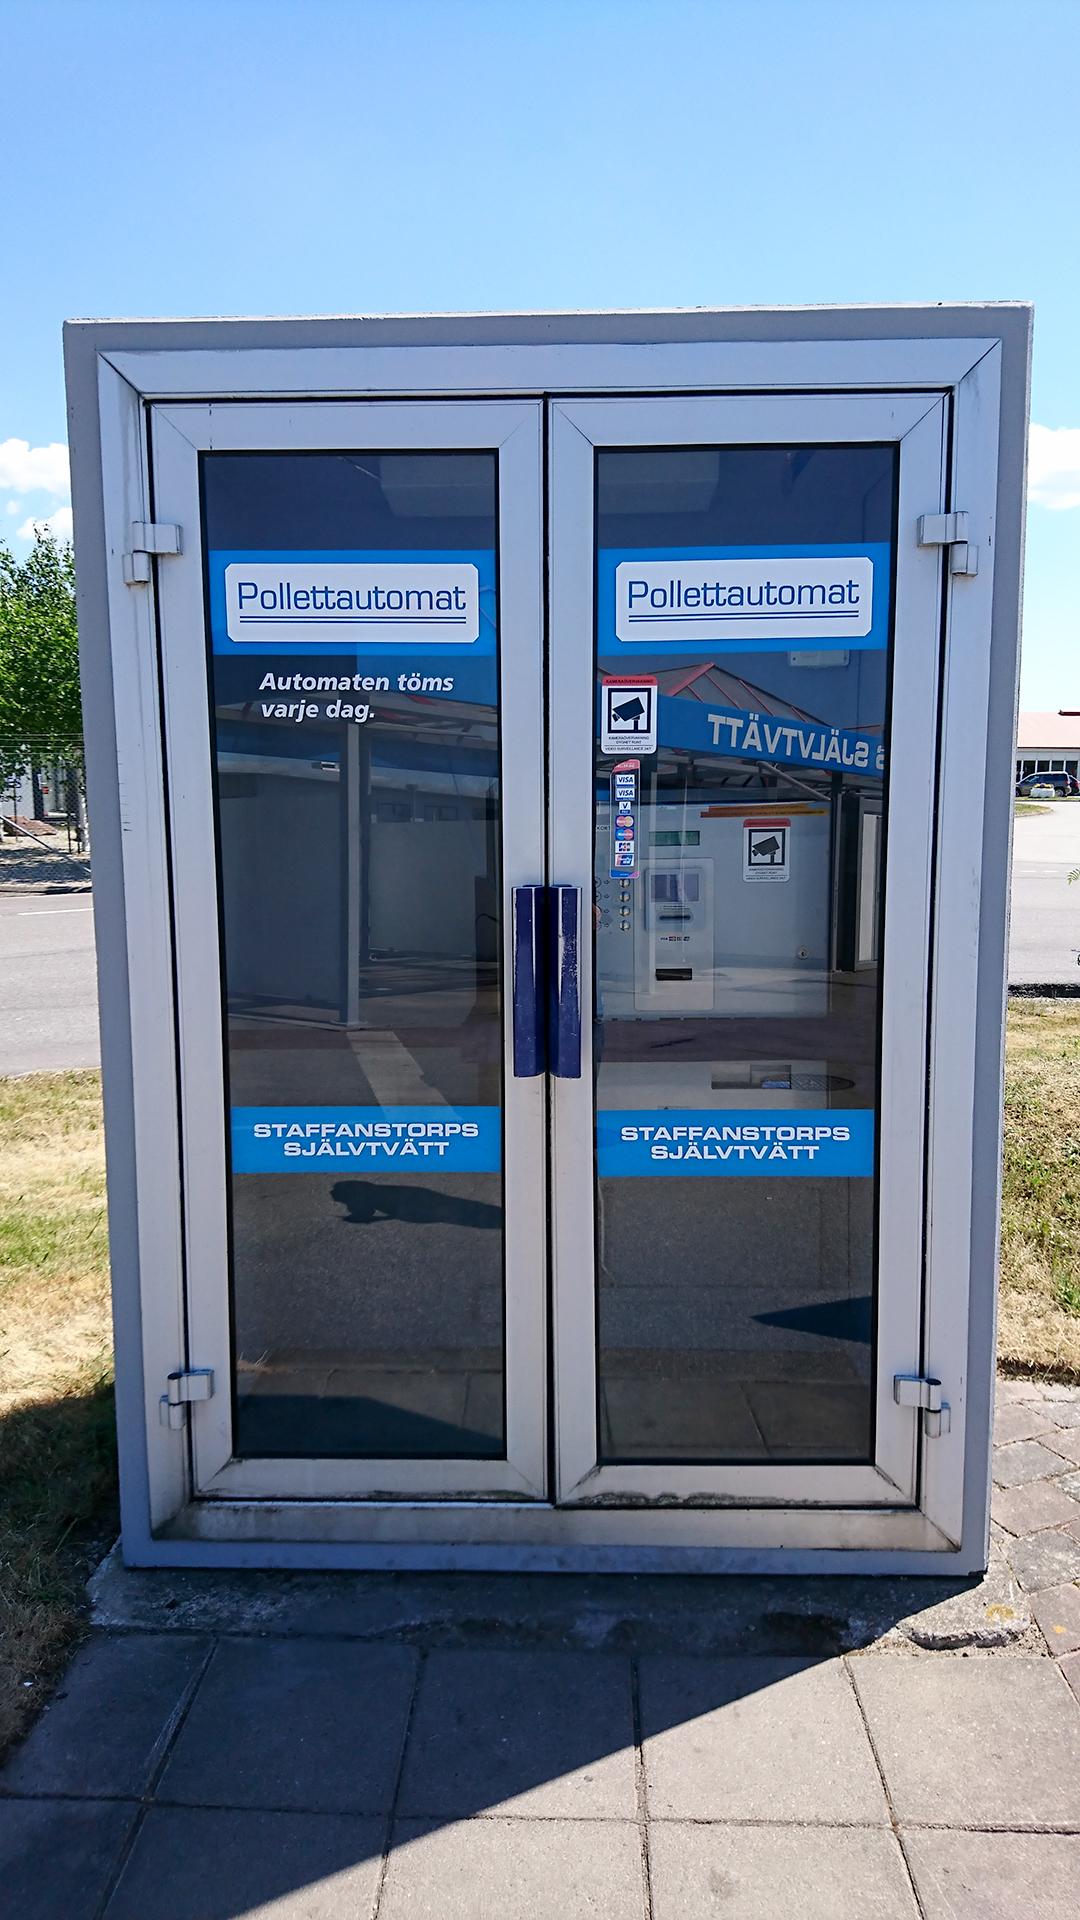 Pollettautomat